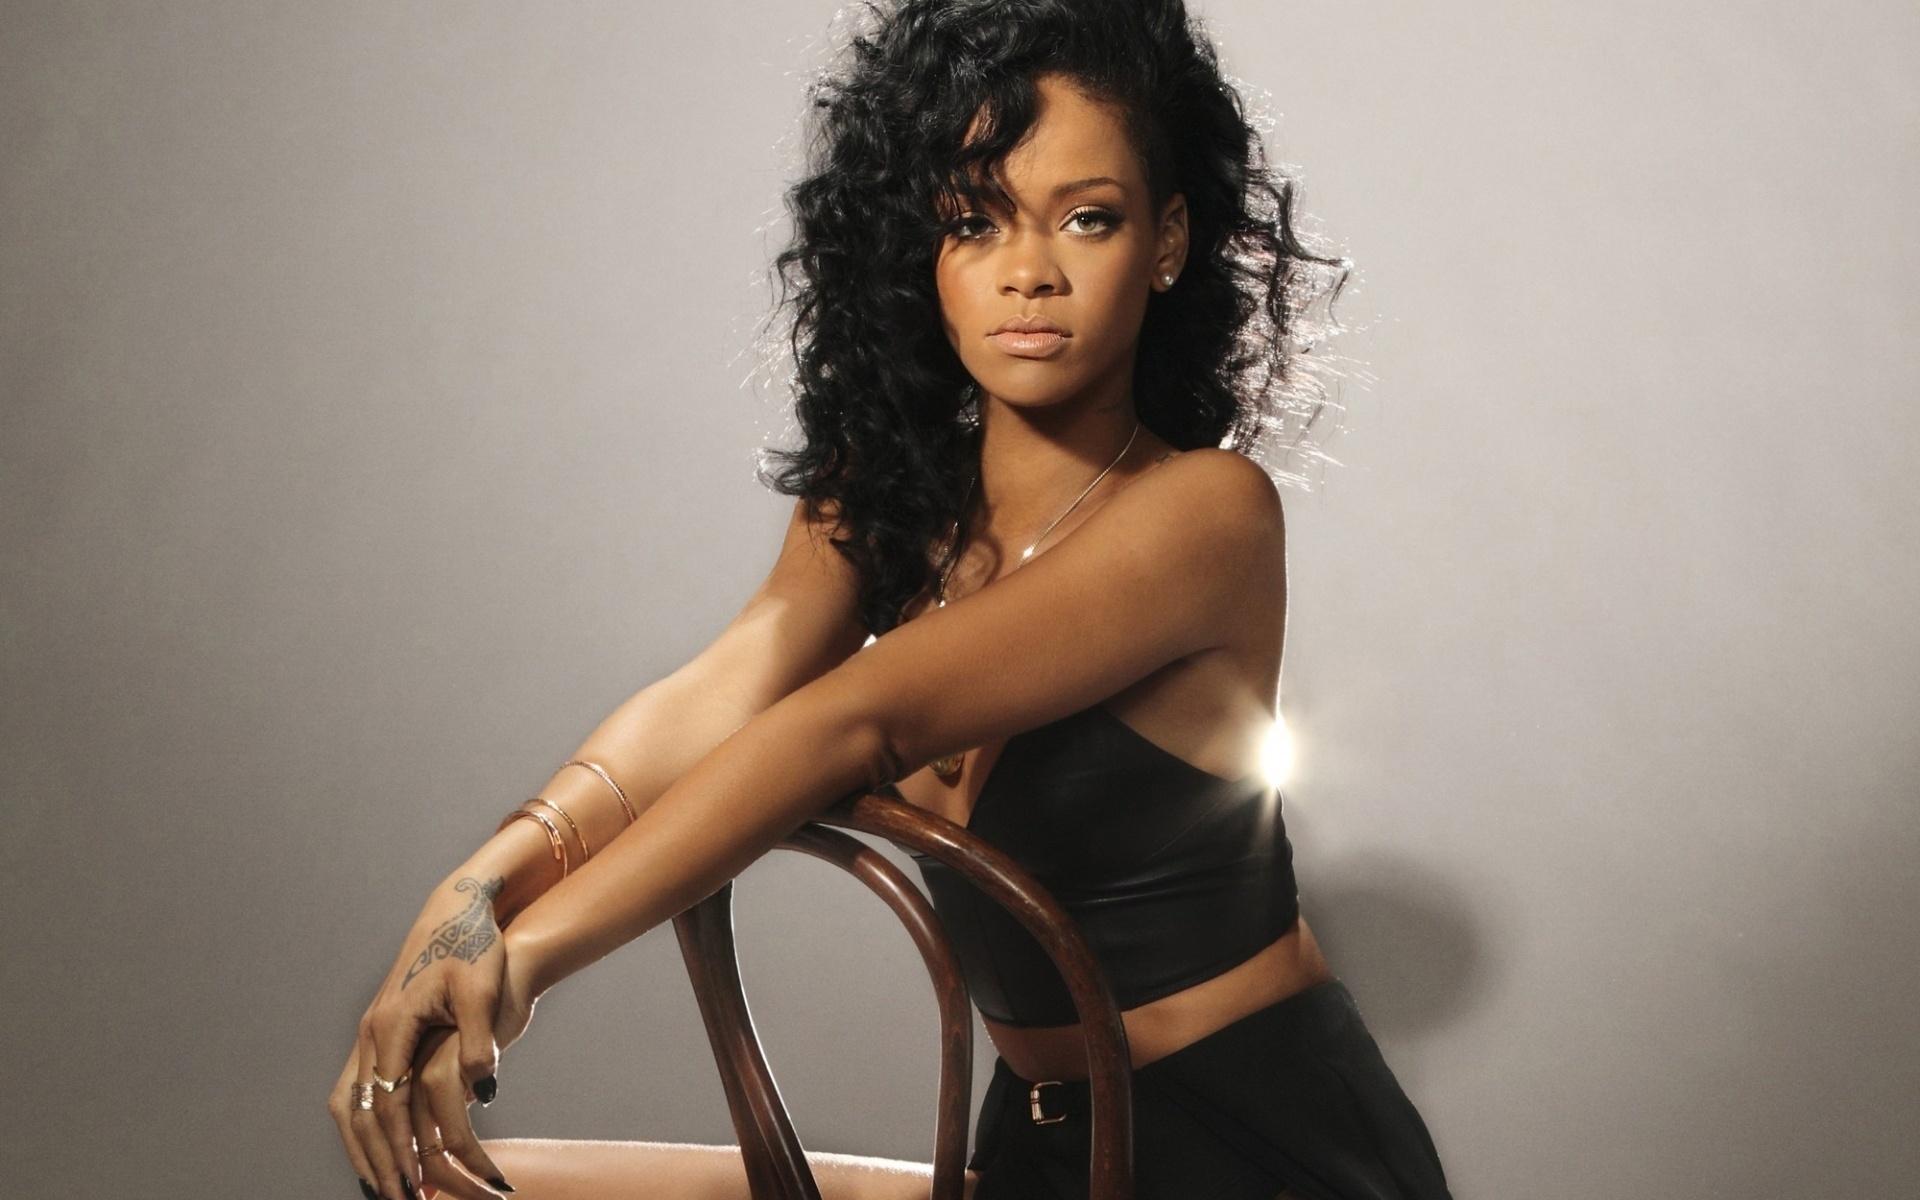 Caribbean Iphone Wallpaper Rihanna Hd Wallpaper Background Image 1920x1200 Id